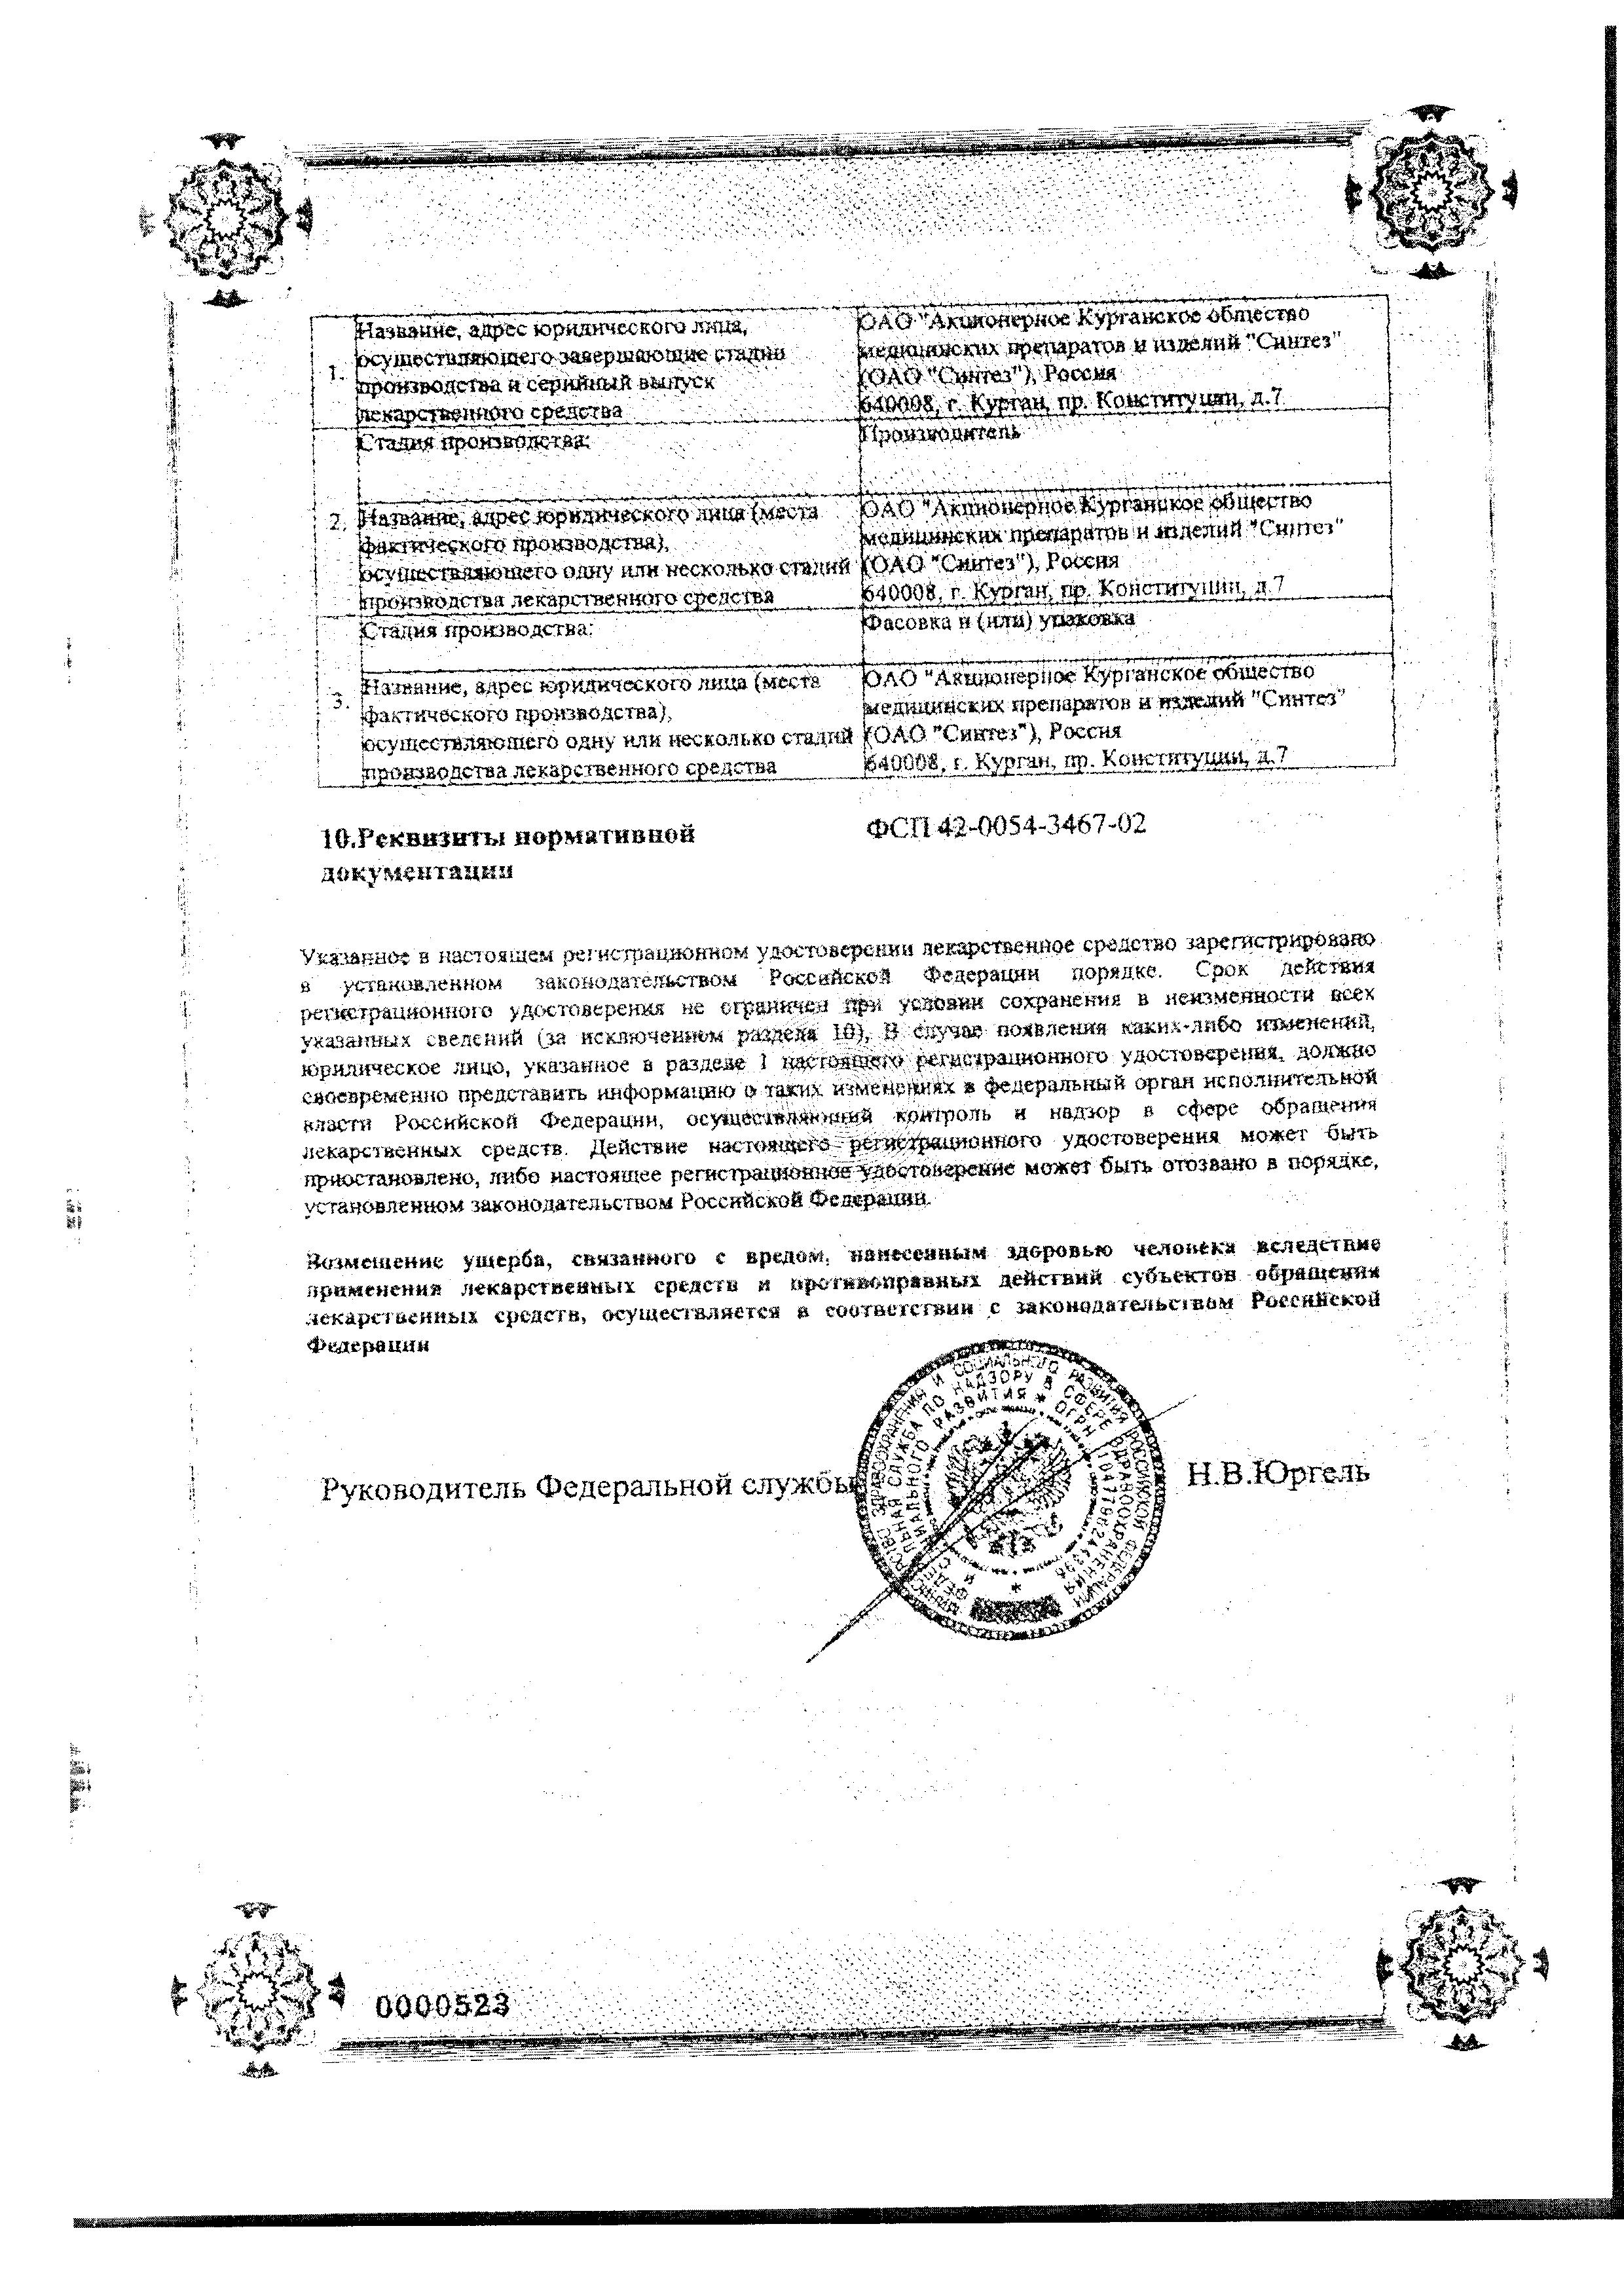 Тетрациклин-АКОС сертификат